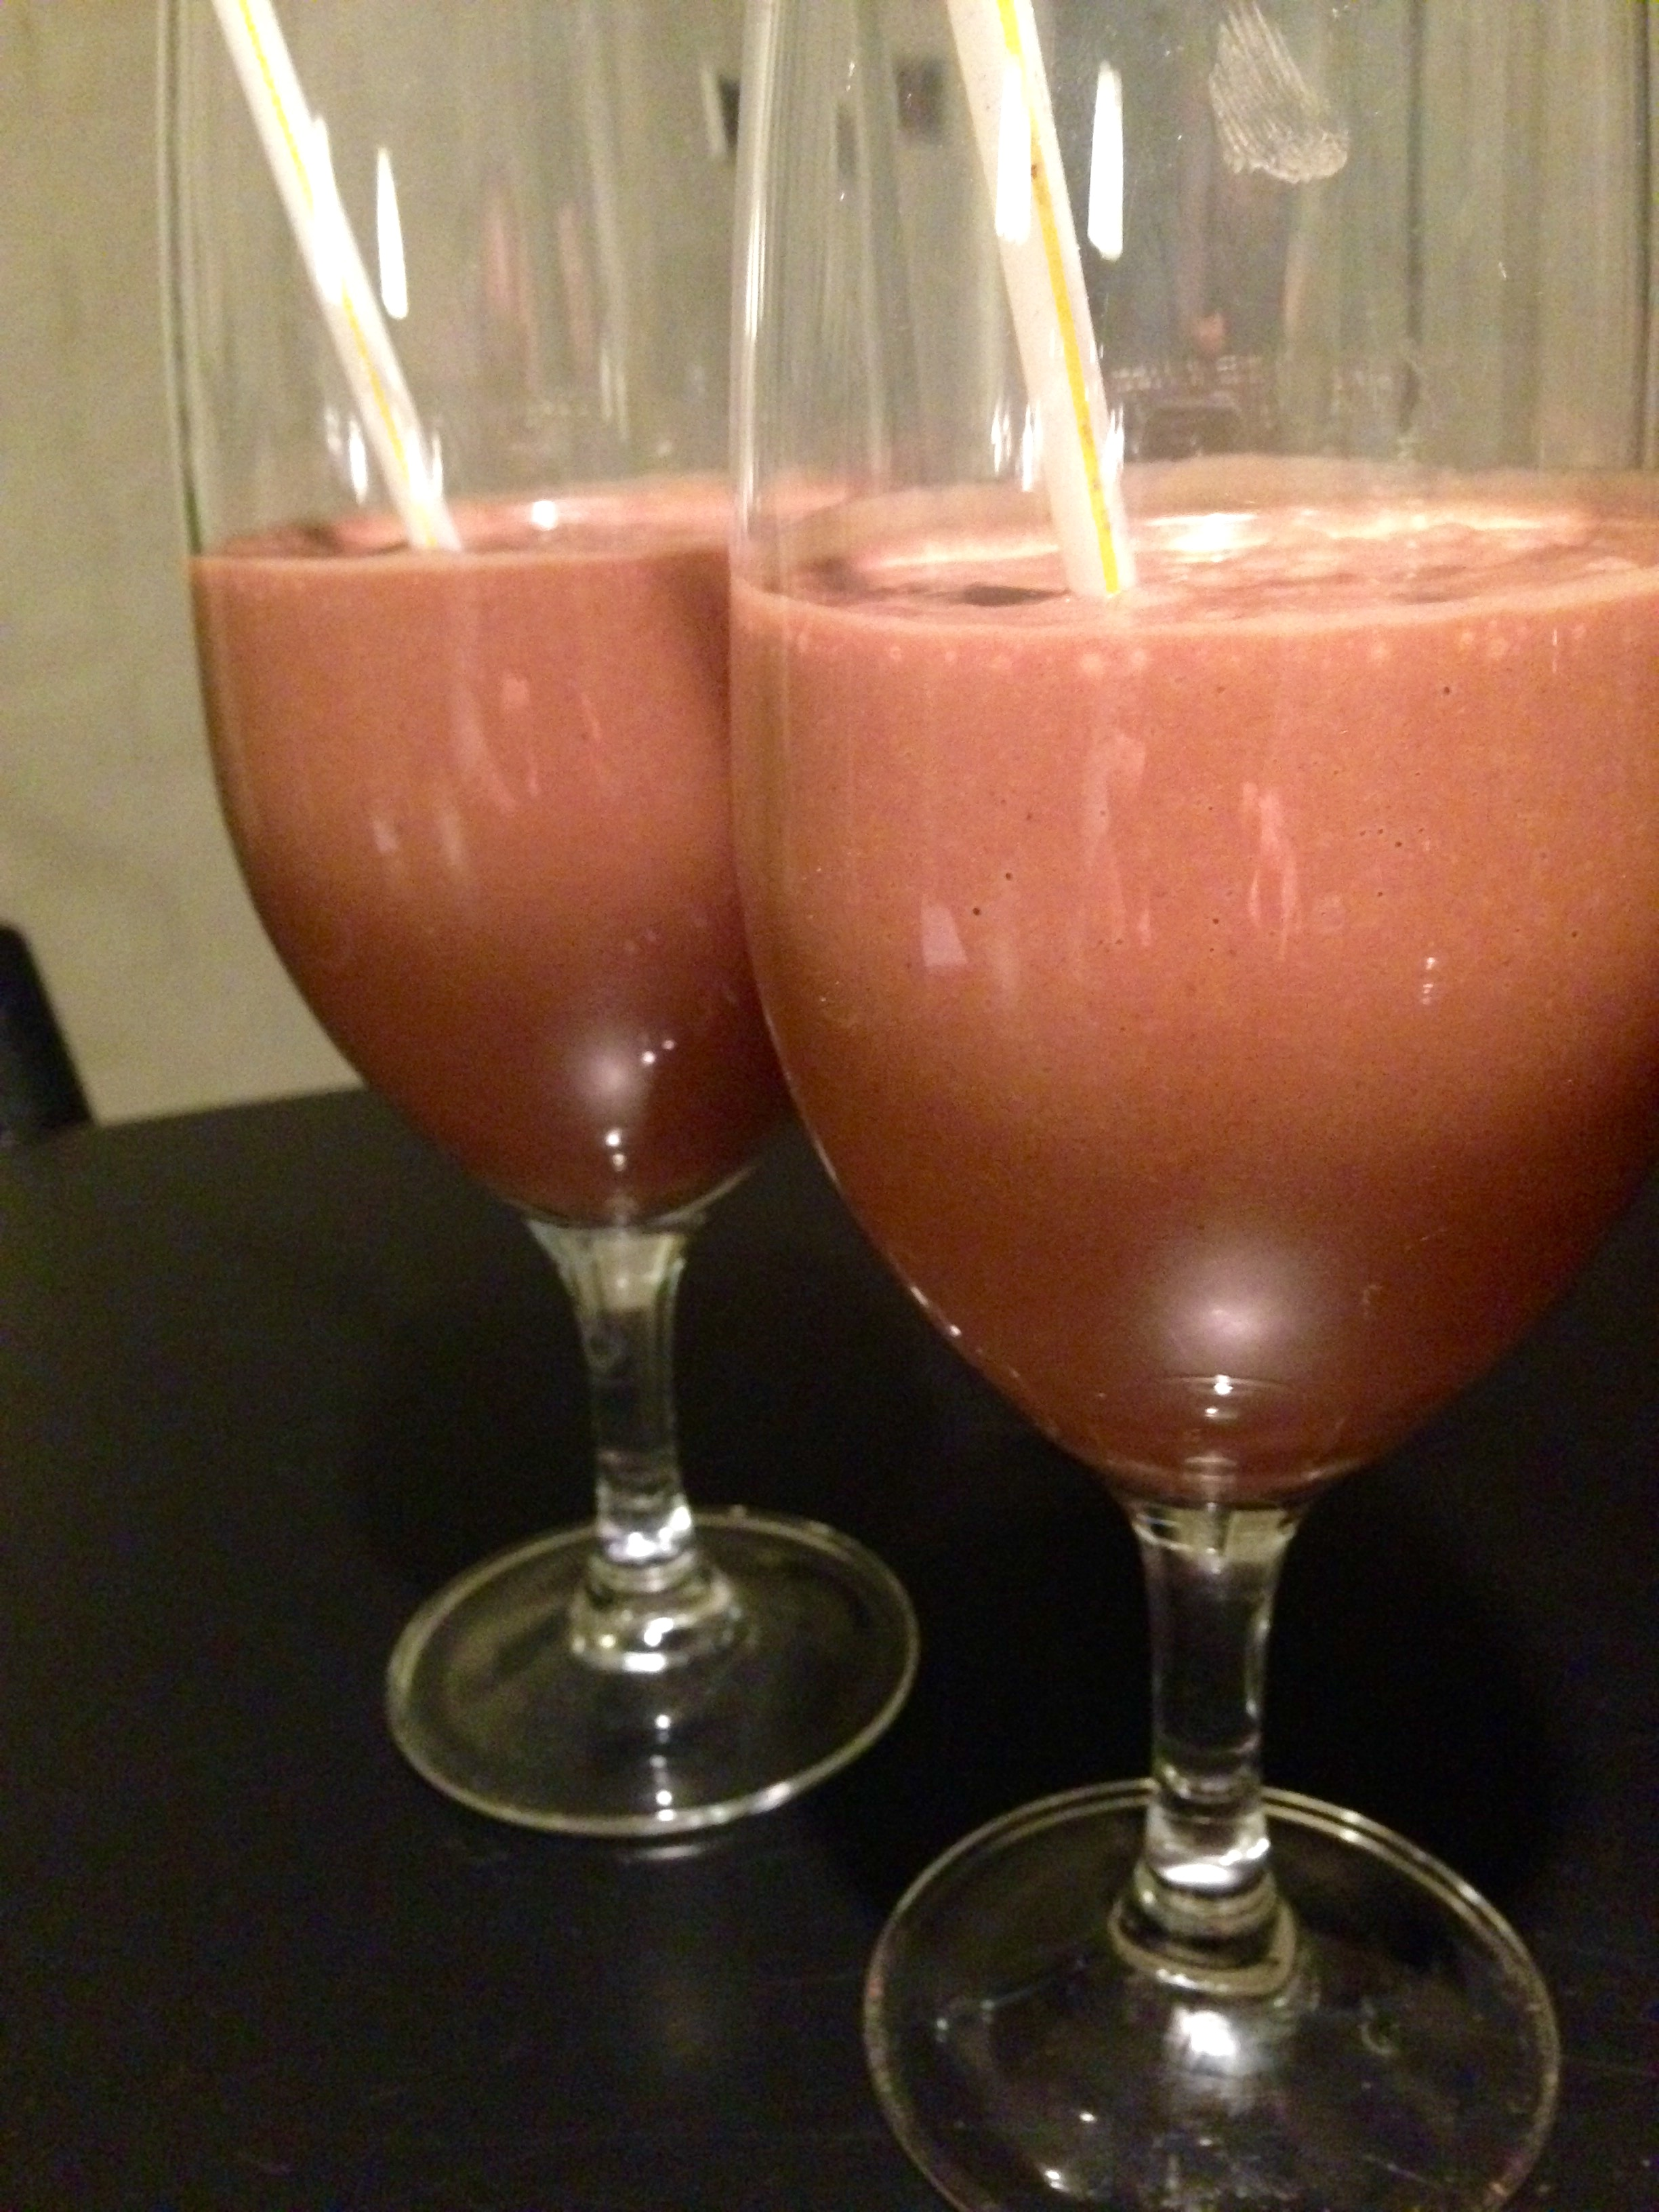 Chokolade-banan smootie med lakrids og chili